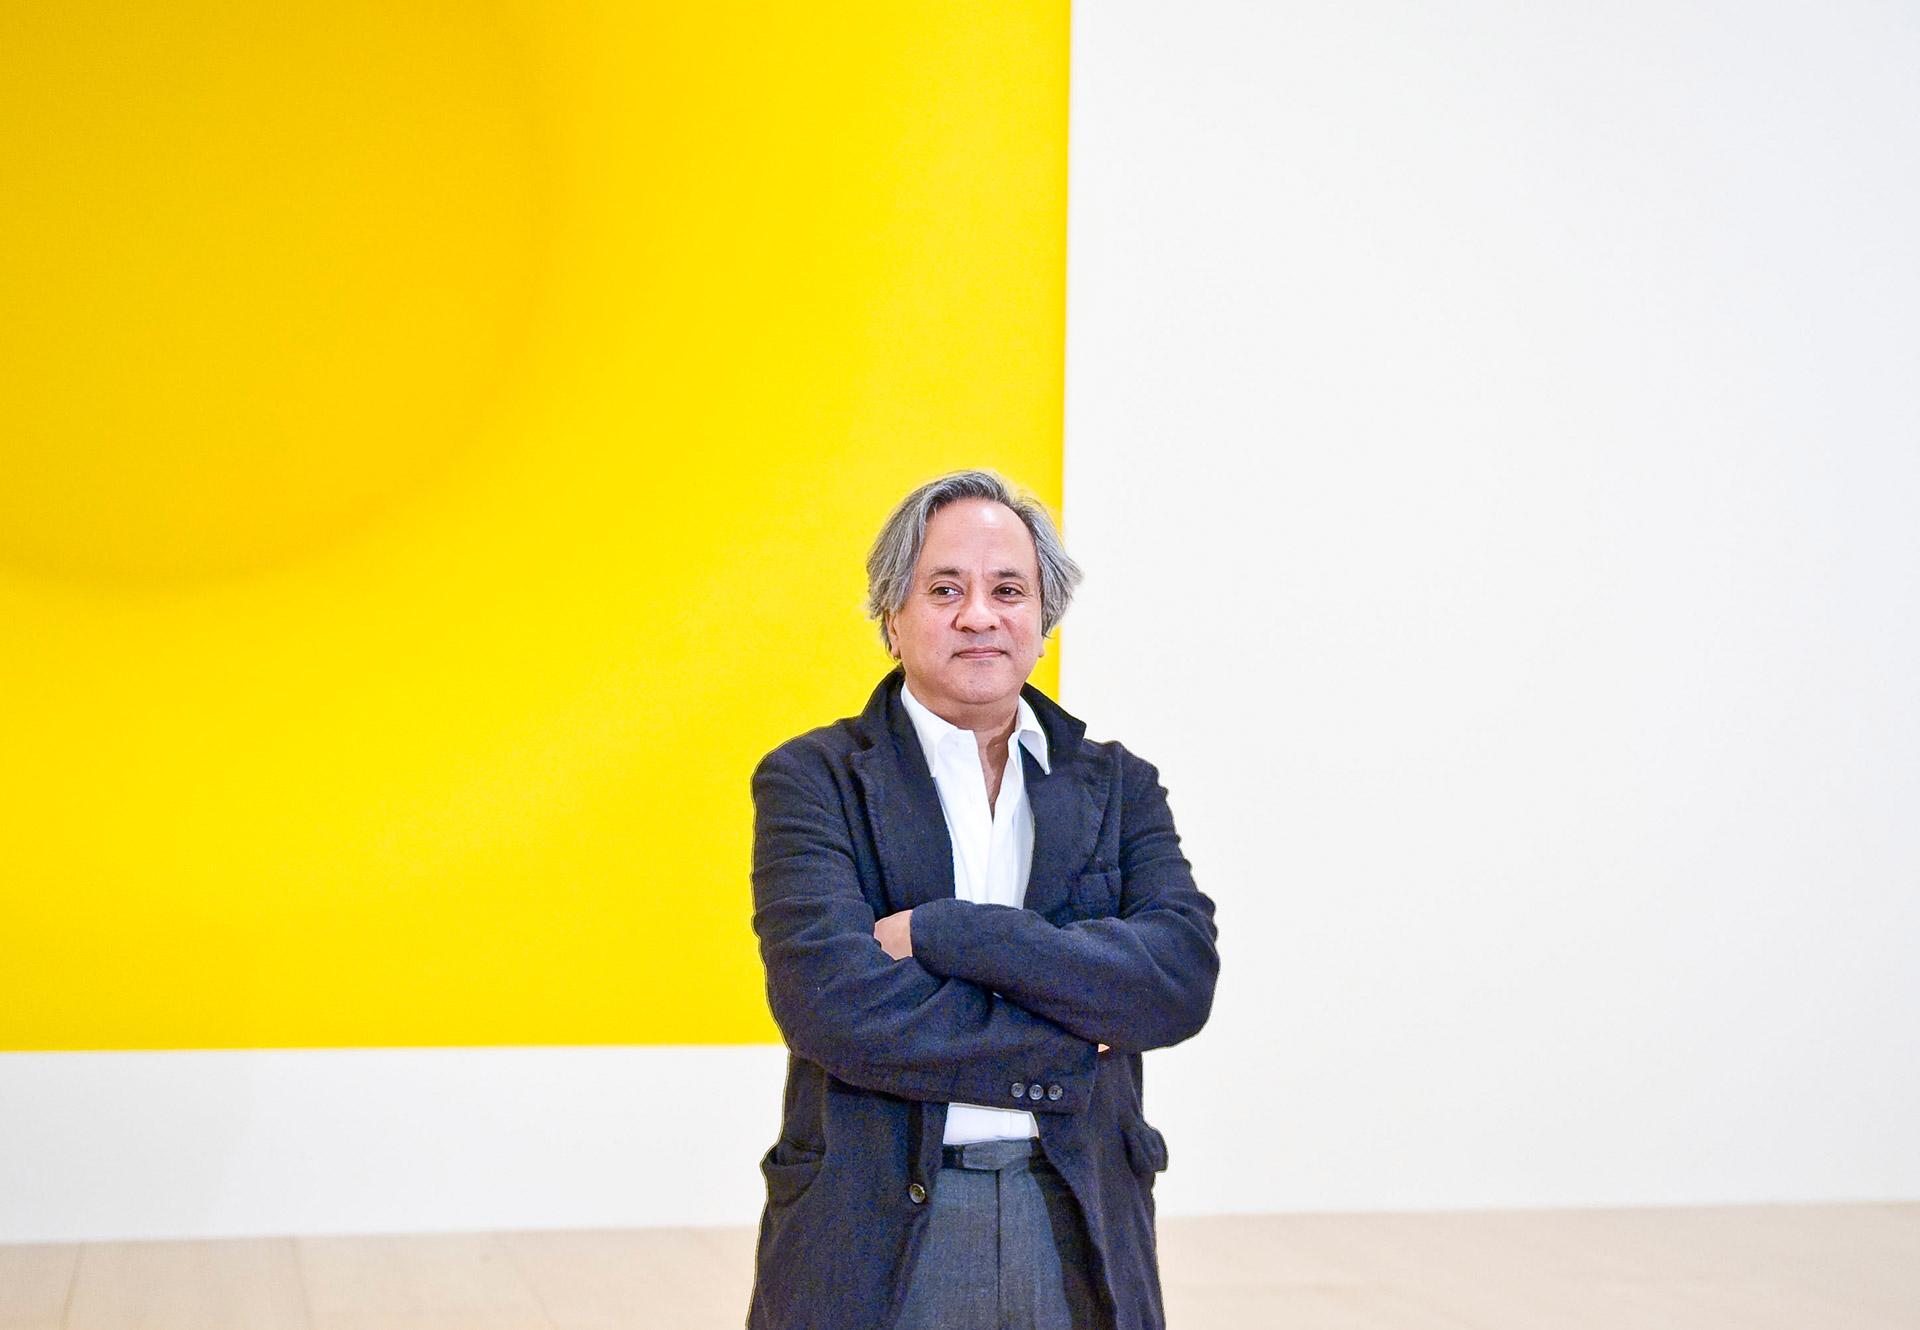 Anish Kapoor | Artistas | Guggenheim Bilbao Museoa